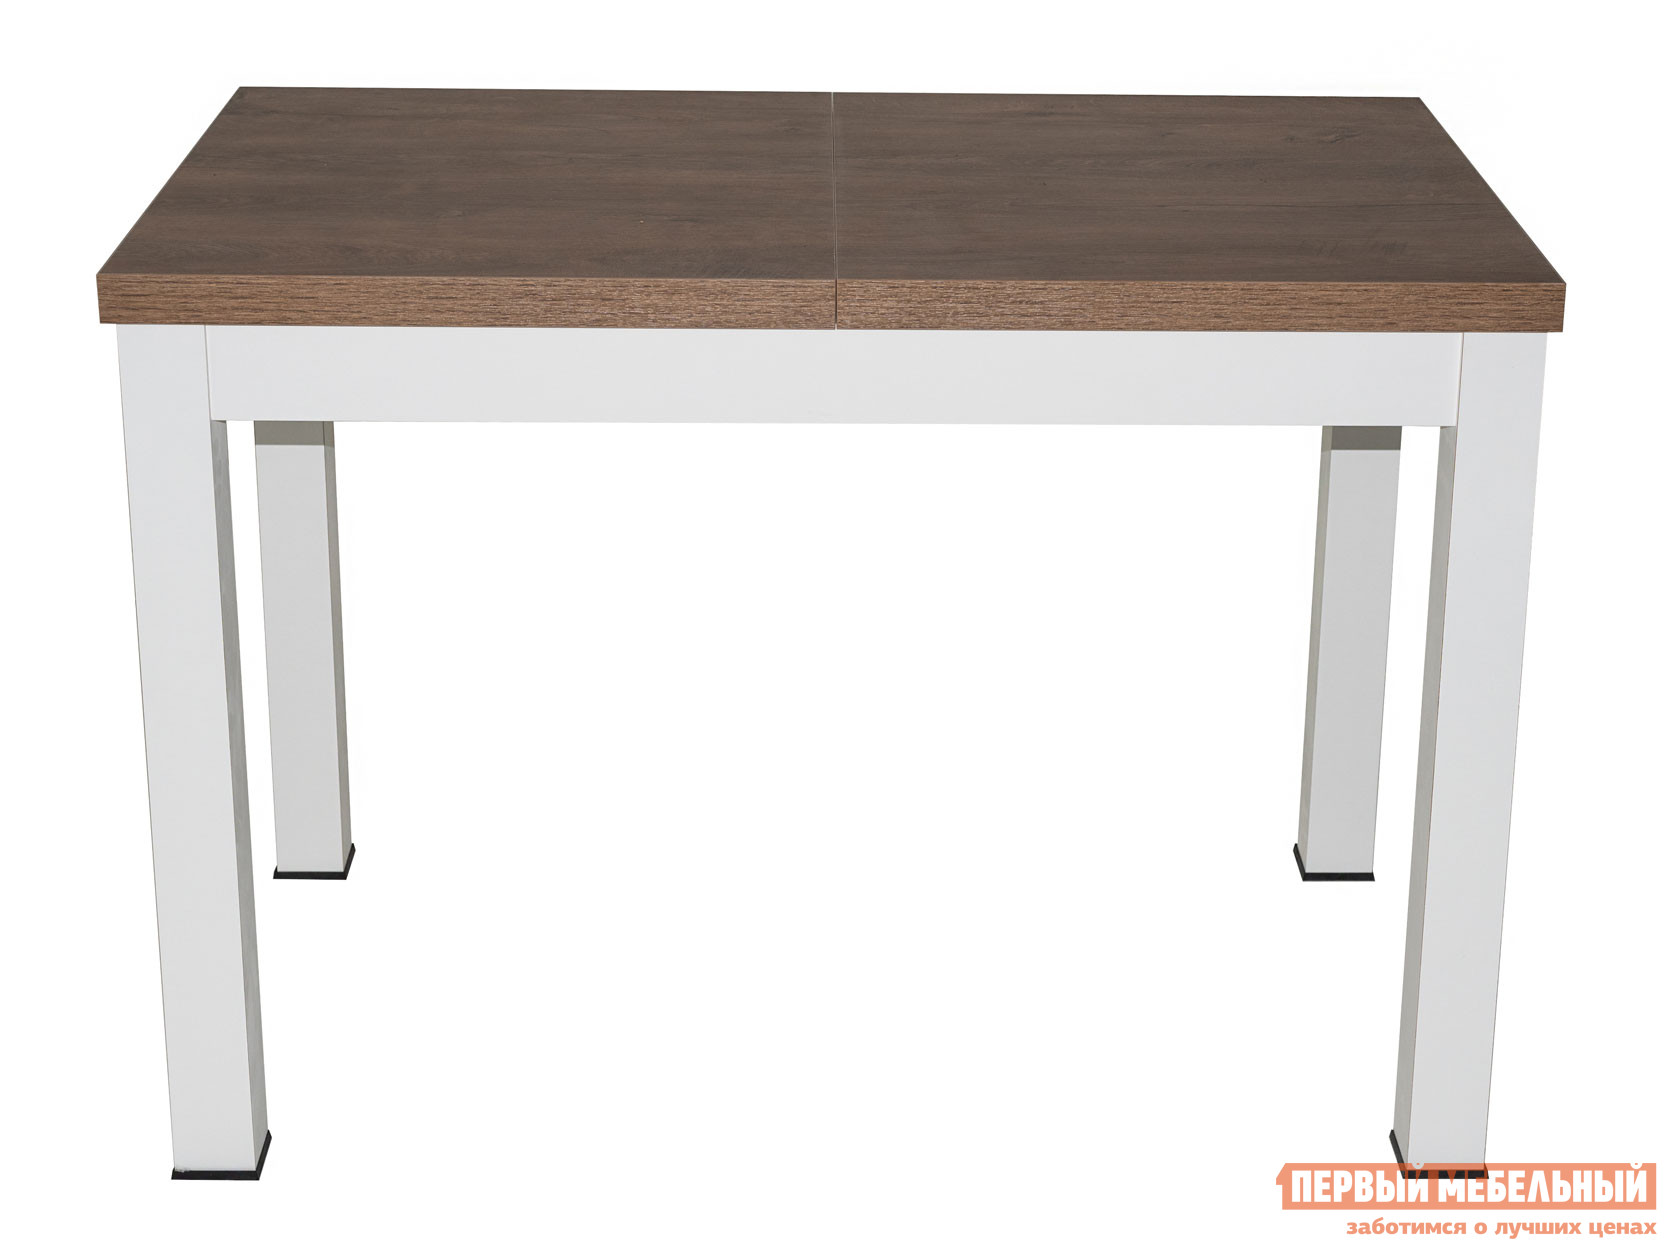 Кухонный стол  Стол раздвижной ONE (СОО), 1100(1490)*670*760/ONE 2, 1380(1930)*850*760 Белый / Дуб Канзас, Малый